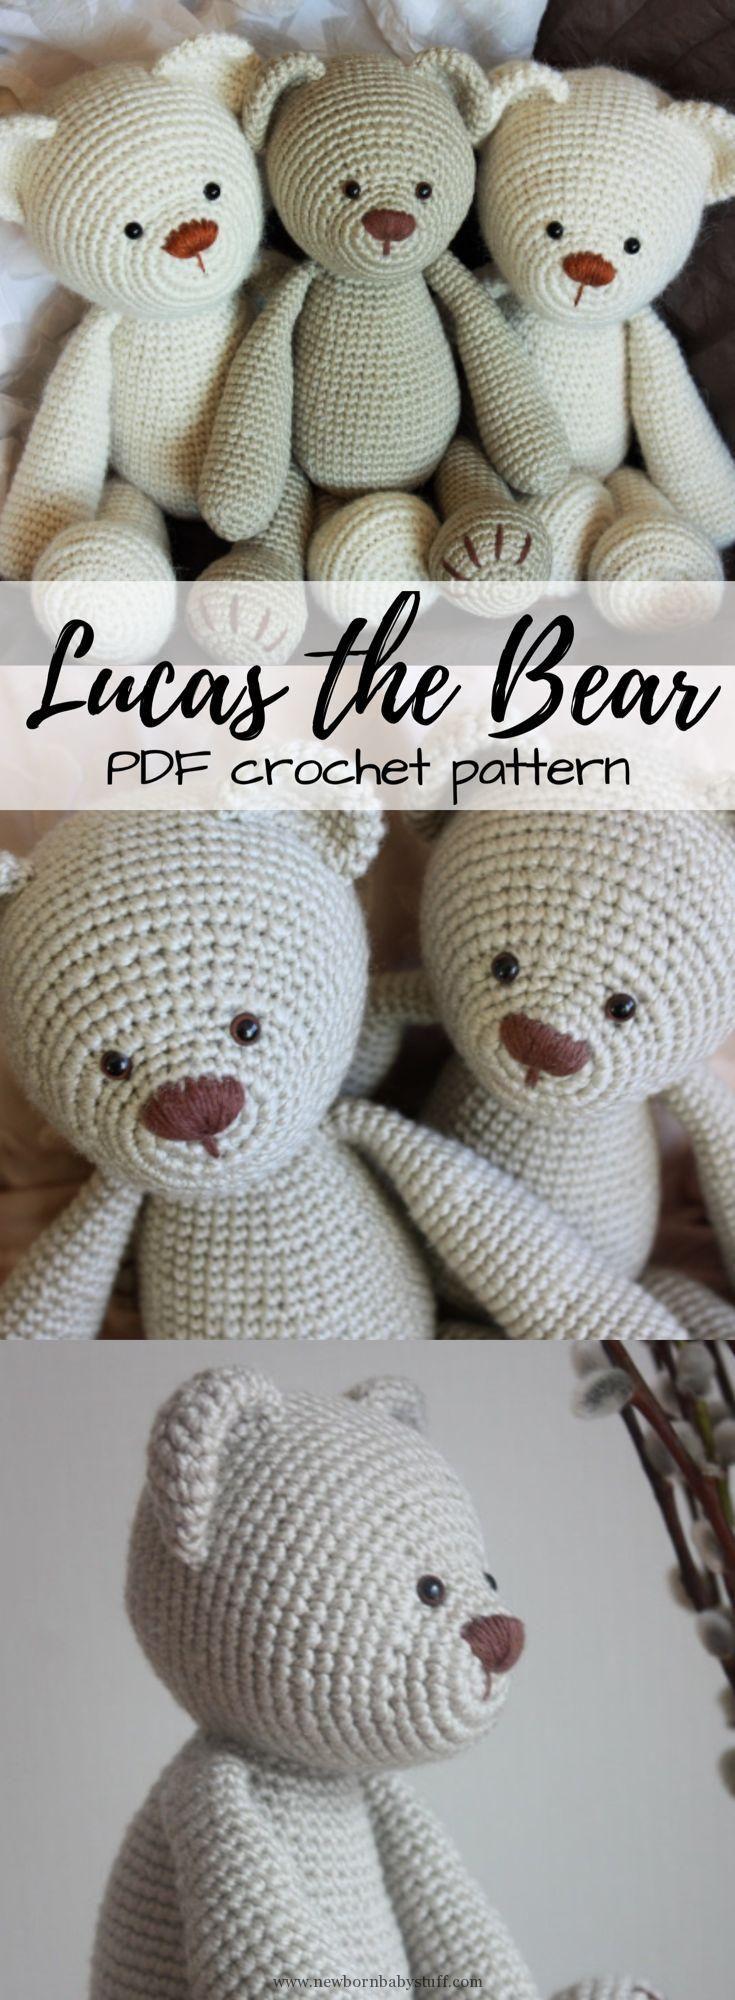 Baby Knitting Patterns Lucas the bear PDF crochet pattern. Cute ...